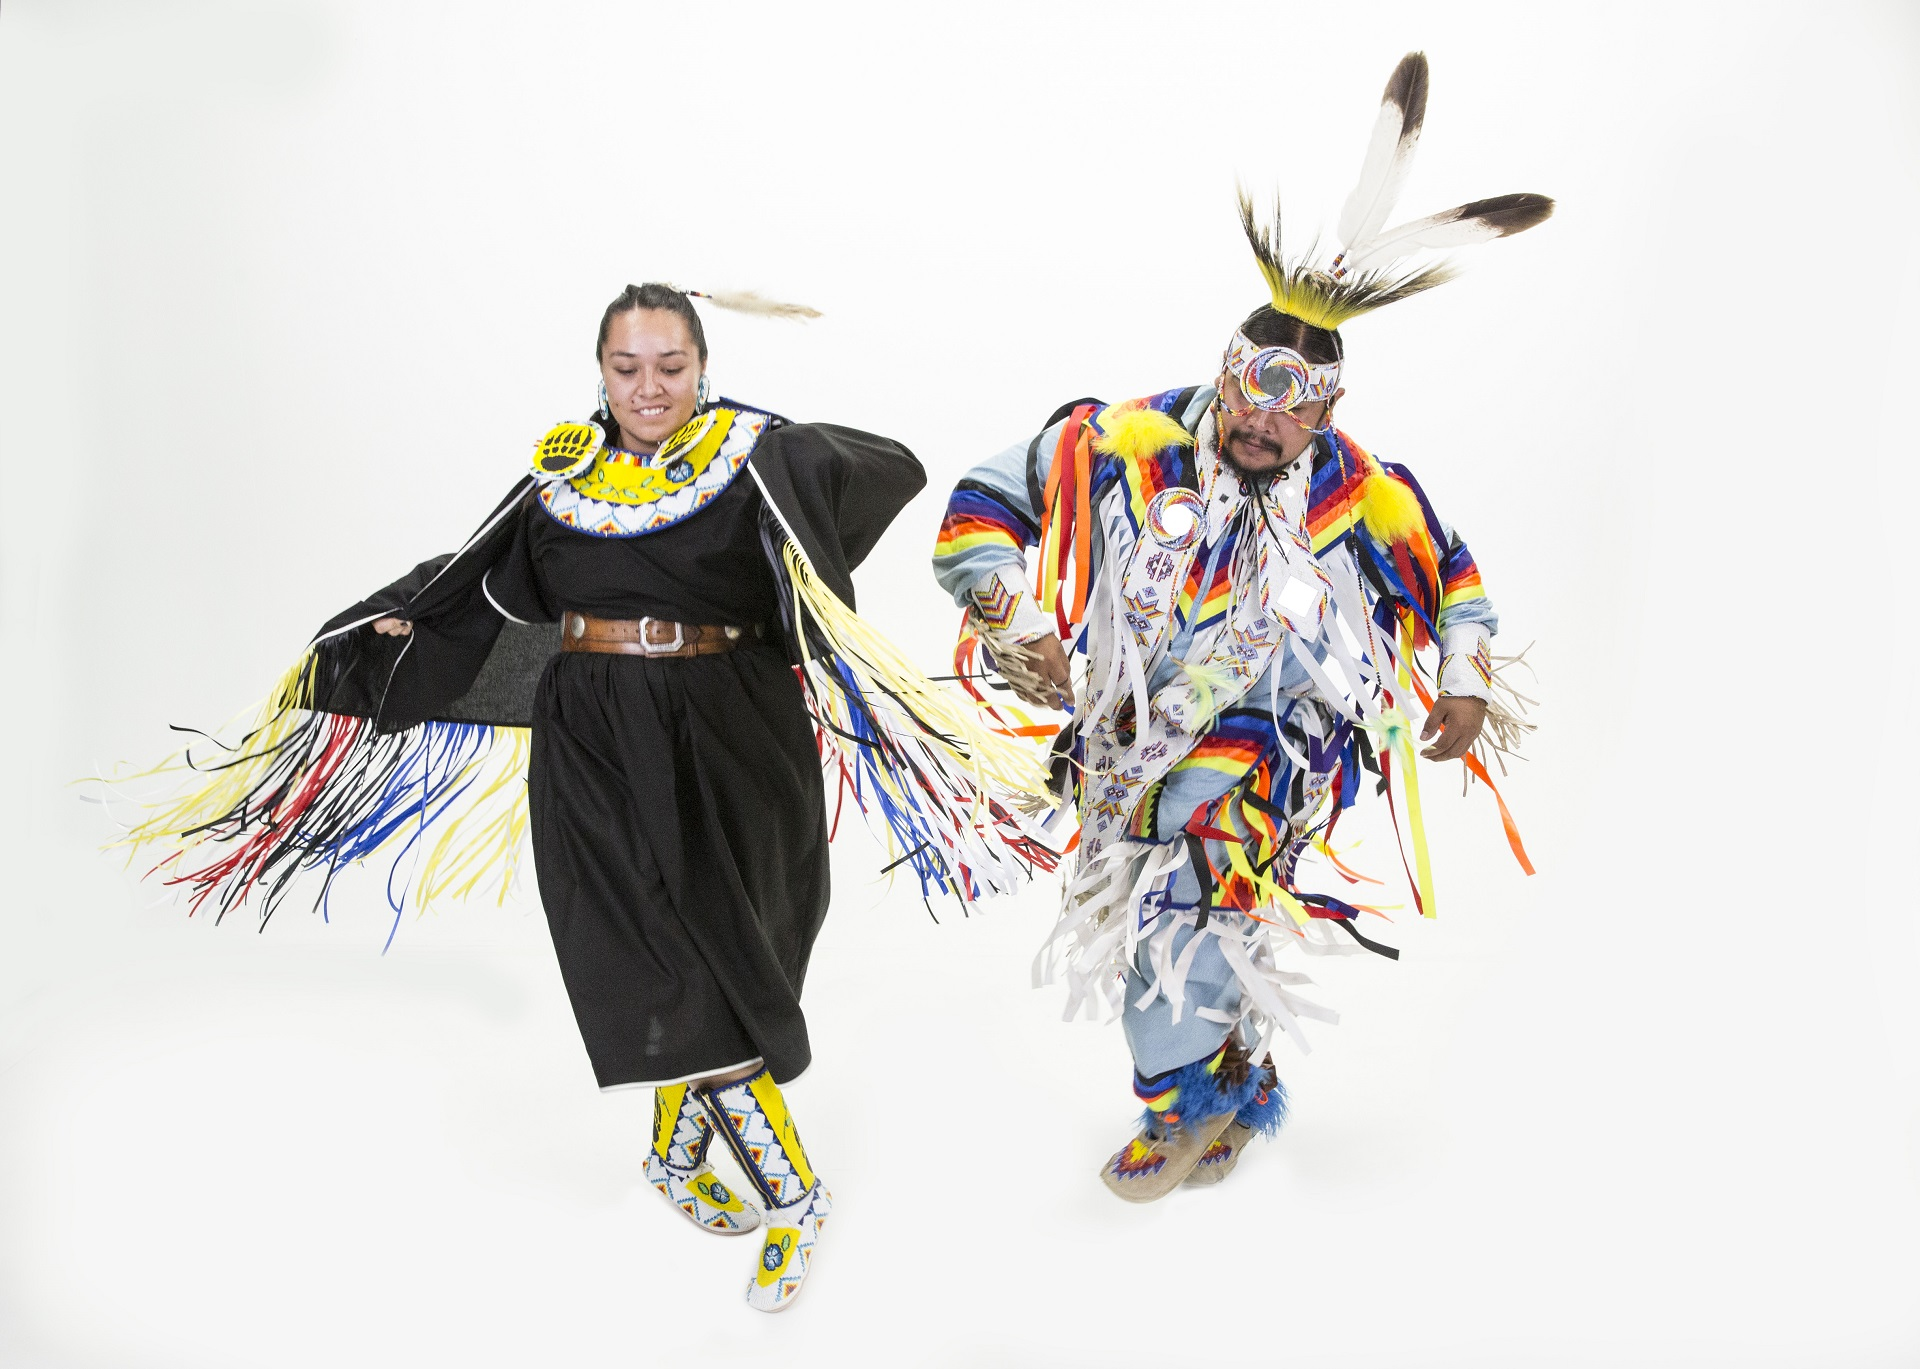 Pow wow dancers in full garb